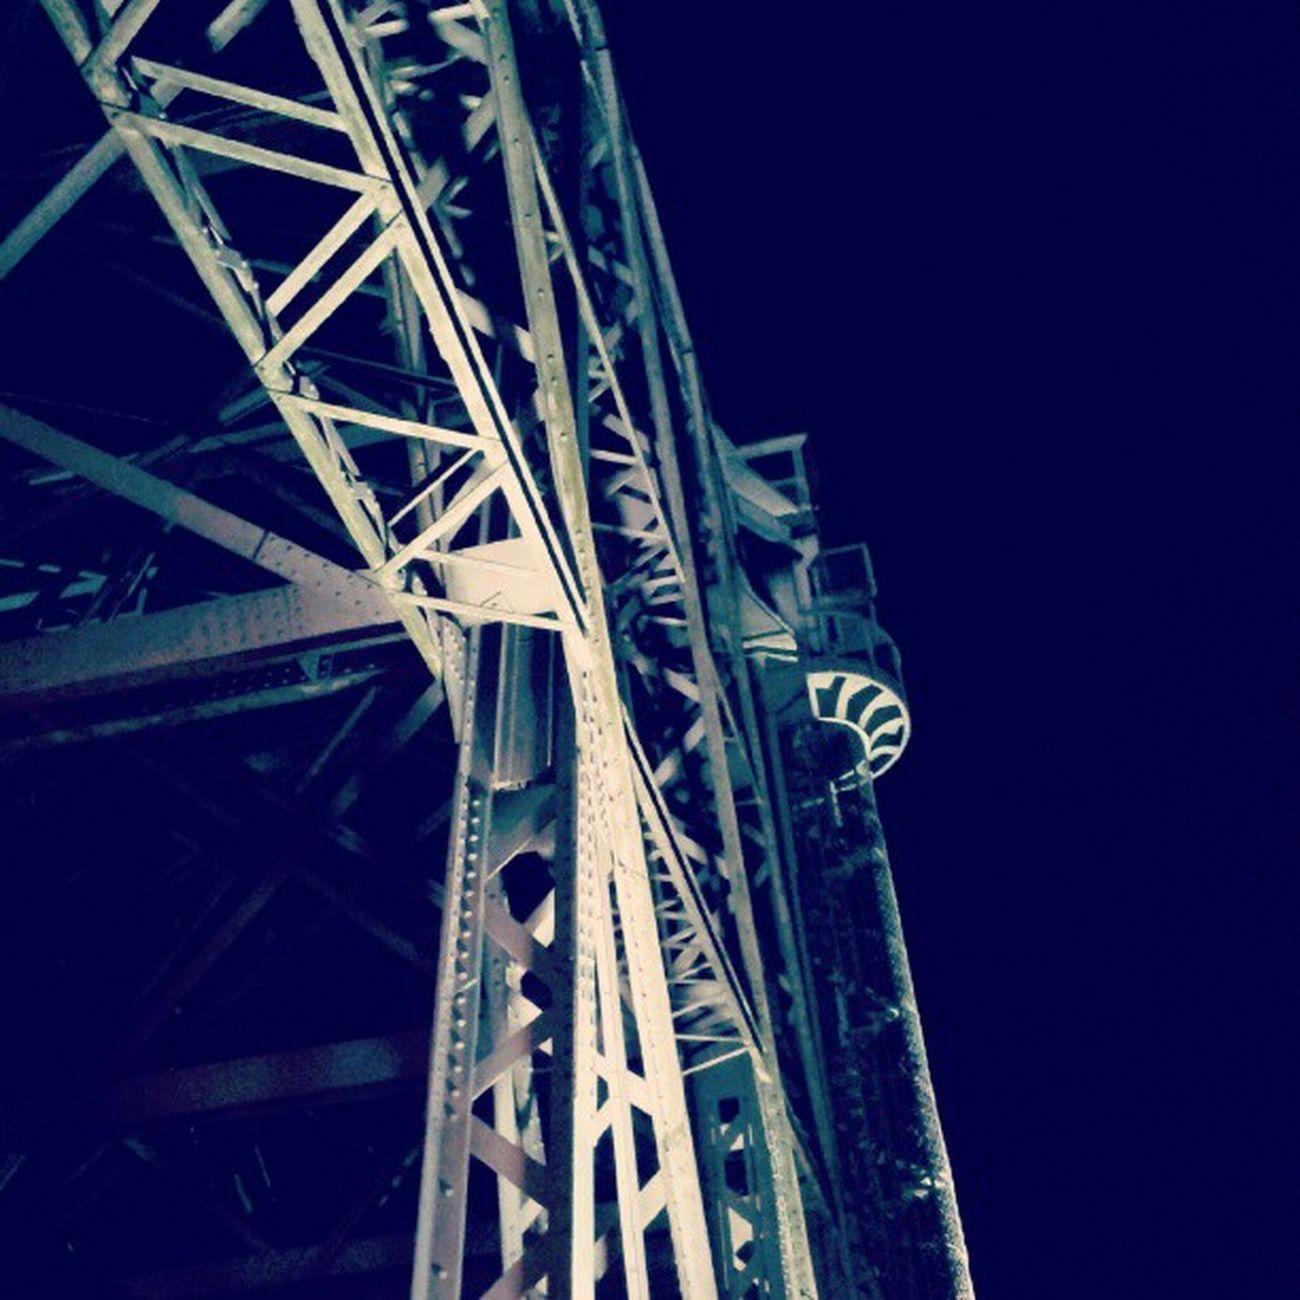 Blaues Wunder Dresden dis_dd #dresden #blaueswunder #bridge #steel #night #instagram #igers #ig #jj #instaretro #instamood #ink361 #blue #picoftheday #photographie #photooftheday #random Picoftheday Instamood Ig Igers Photographie  Jj  Ink361 Instaretro Night Blaueswunder Random Steel Bridge Blue Dresden Photooftheday Instagram